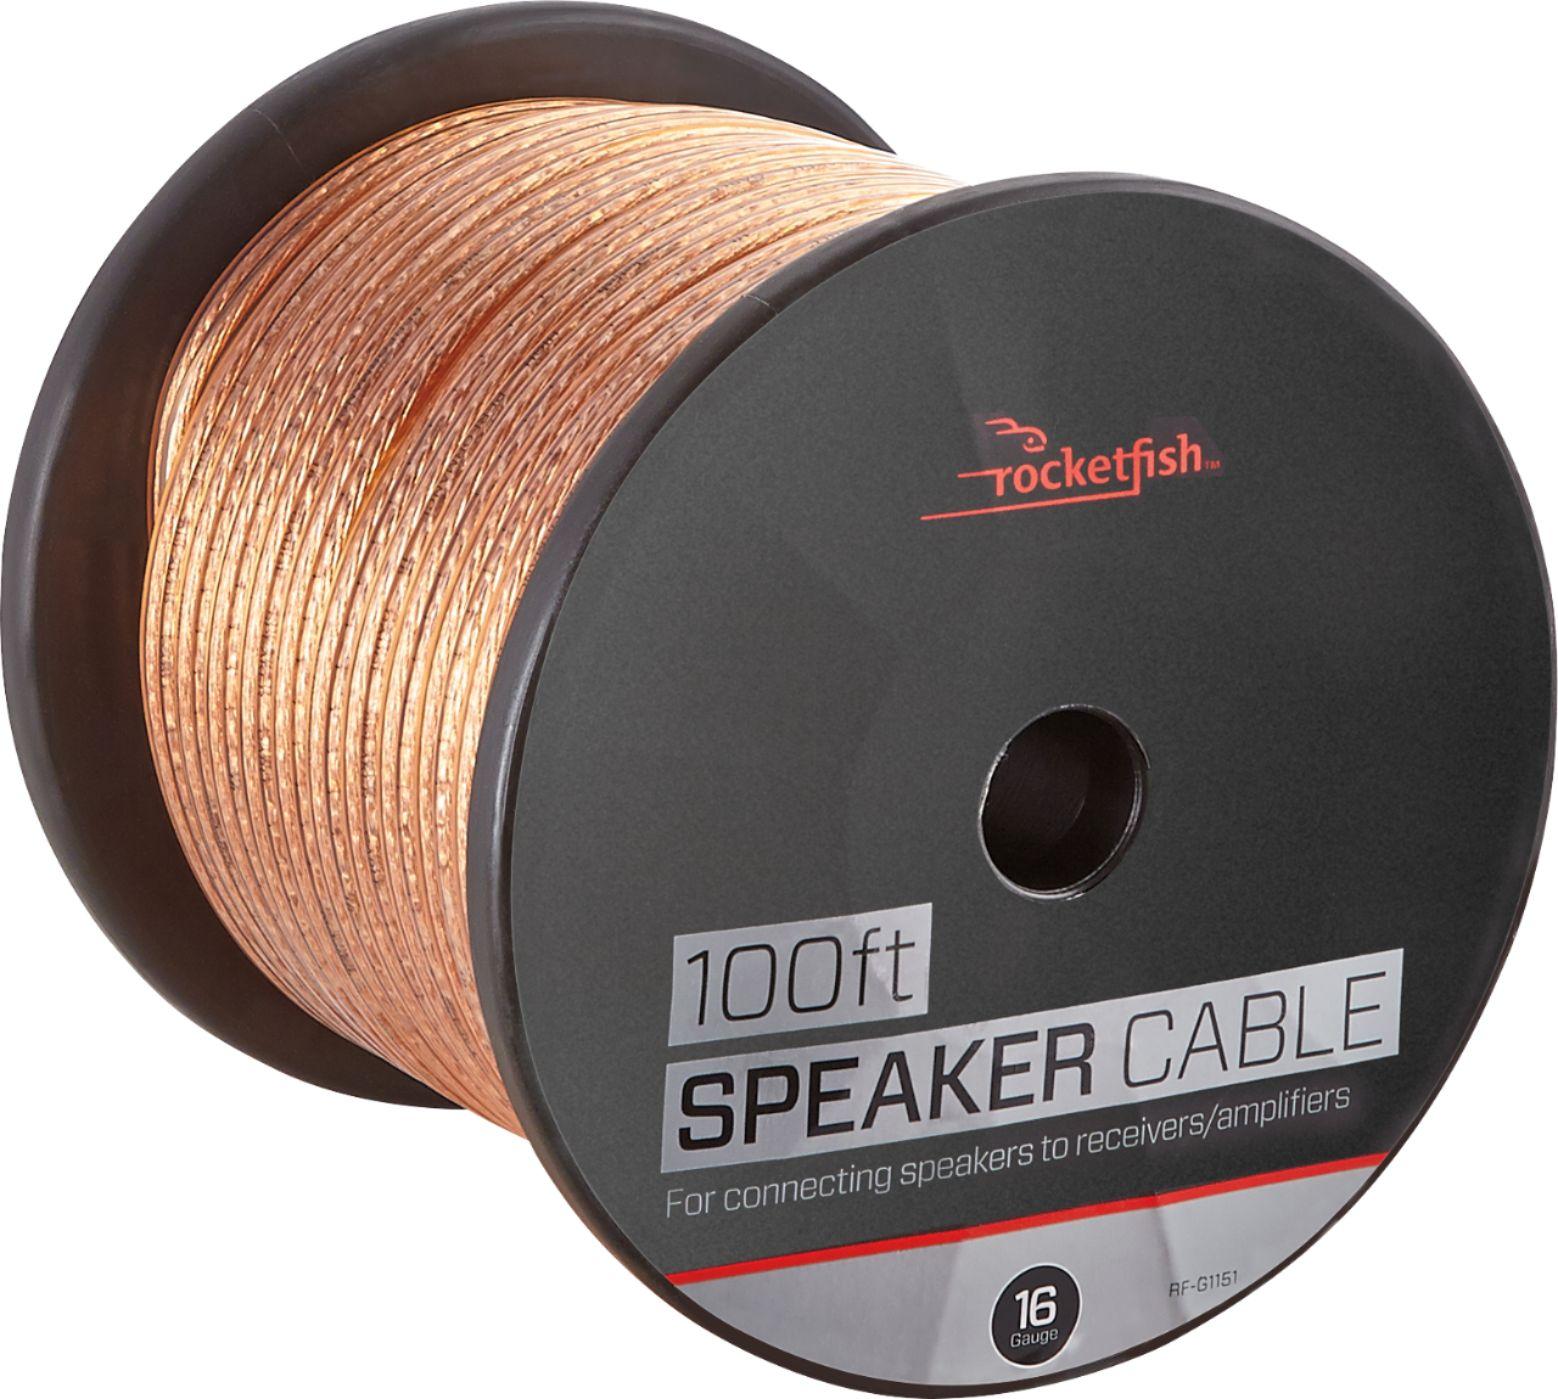 Rocketfish™ - 100 Speaker Wire - 16AWG - Gold - AAA Discounts ...